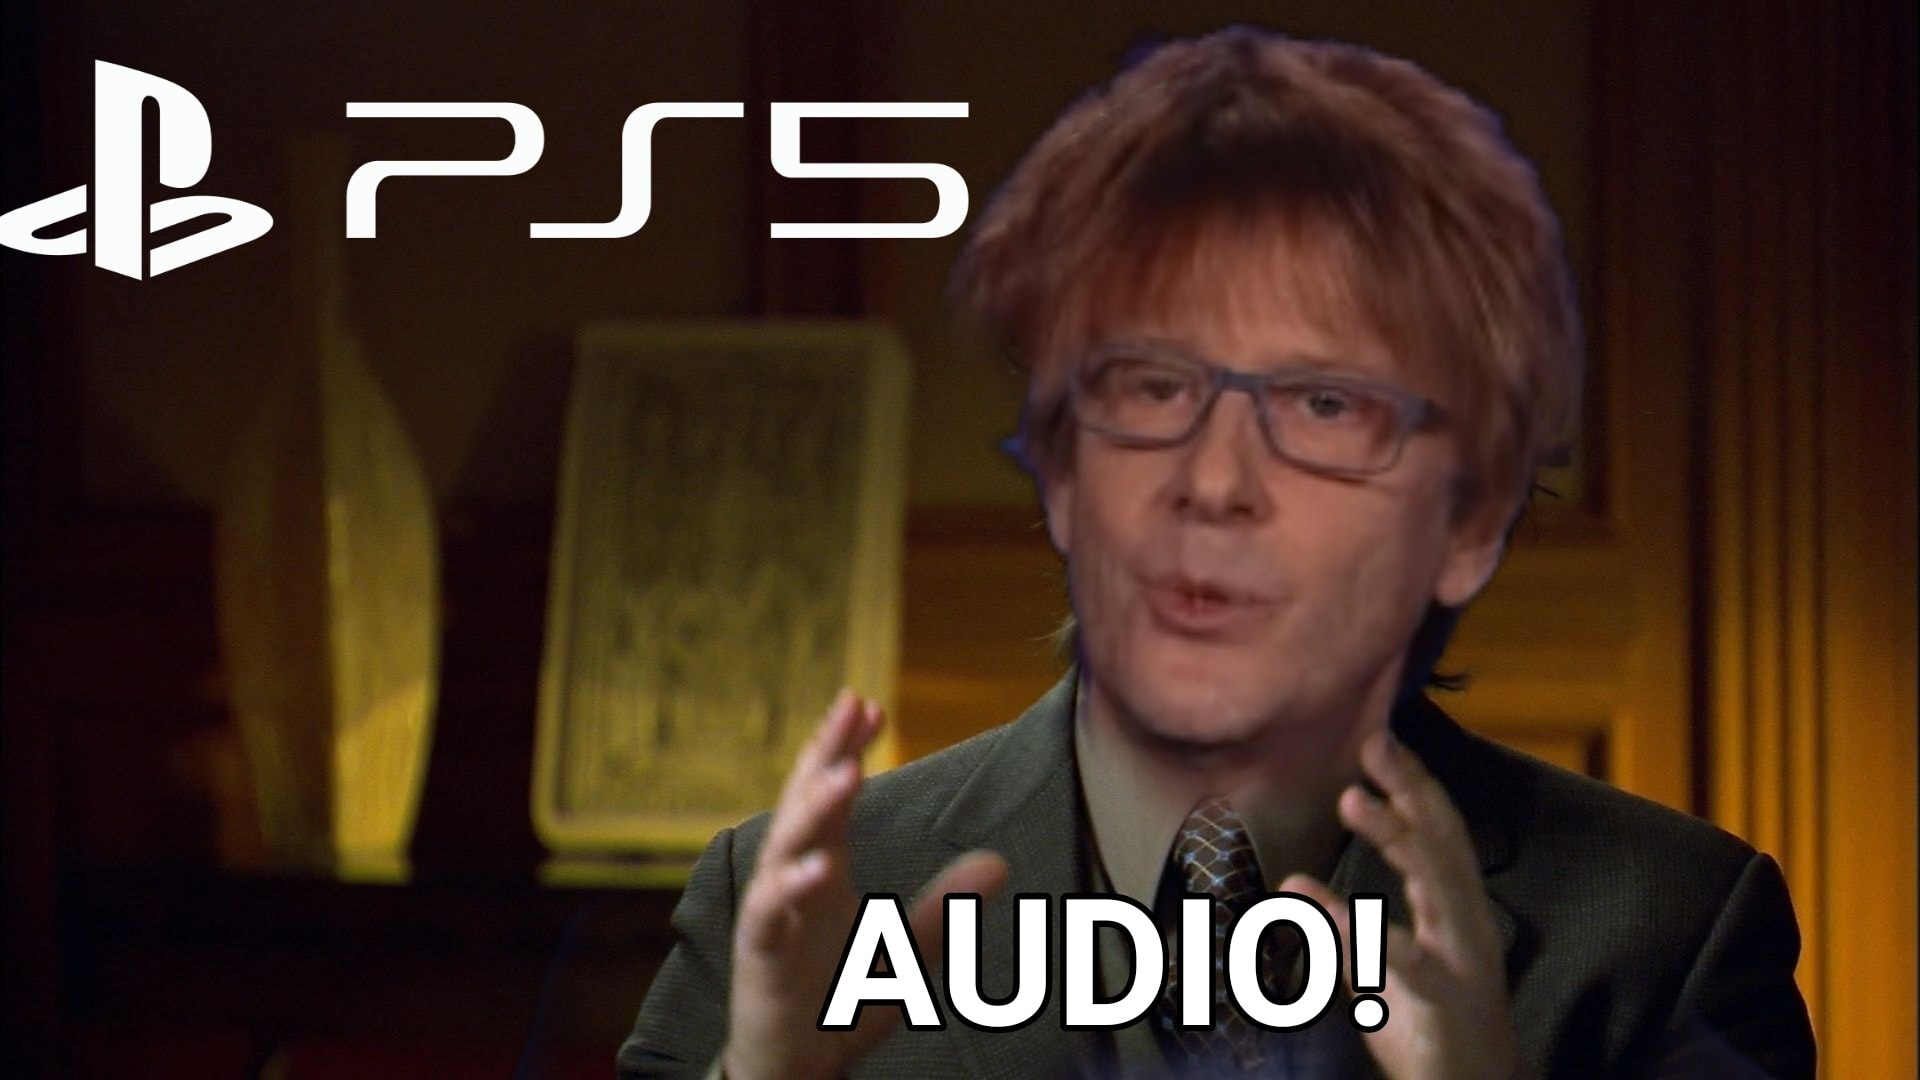 ps5 audioo